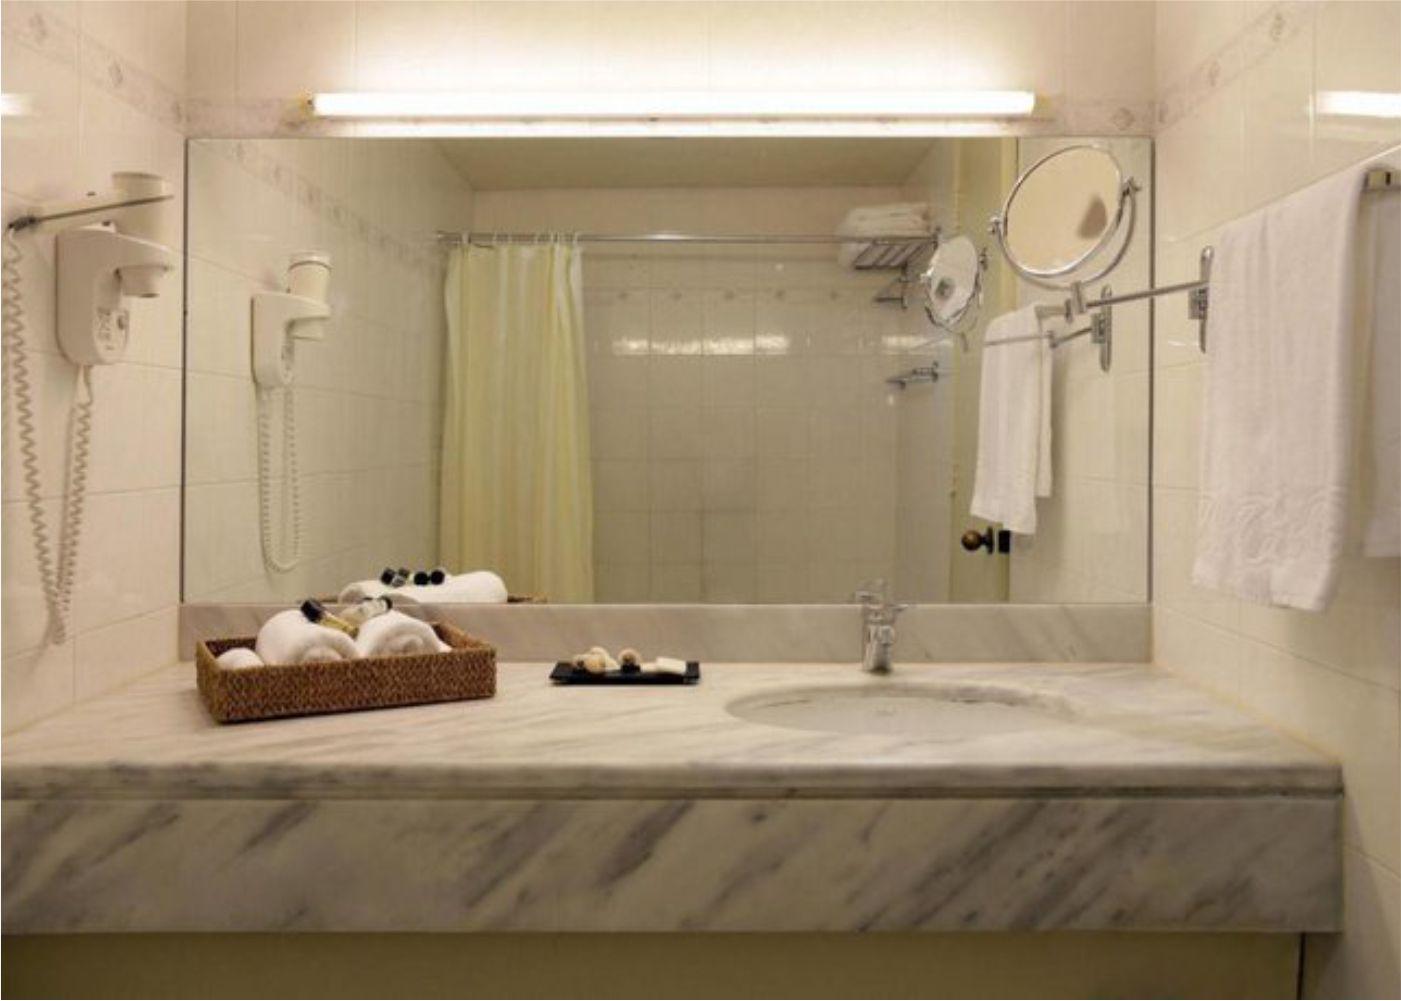 paraskevi-interior-kaningos-21-hotel-2